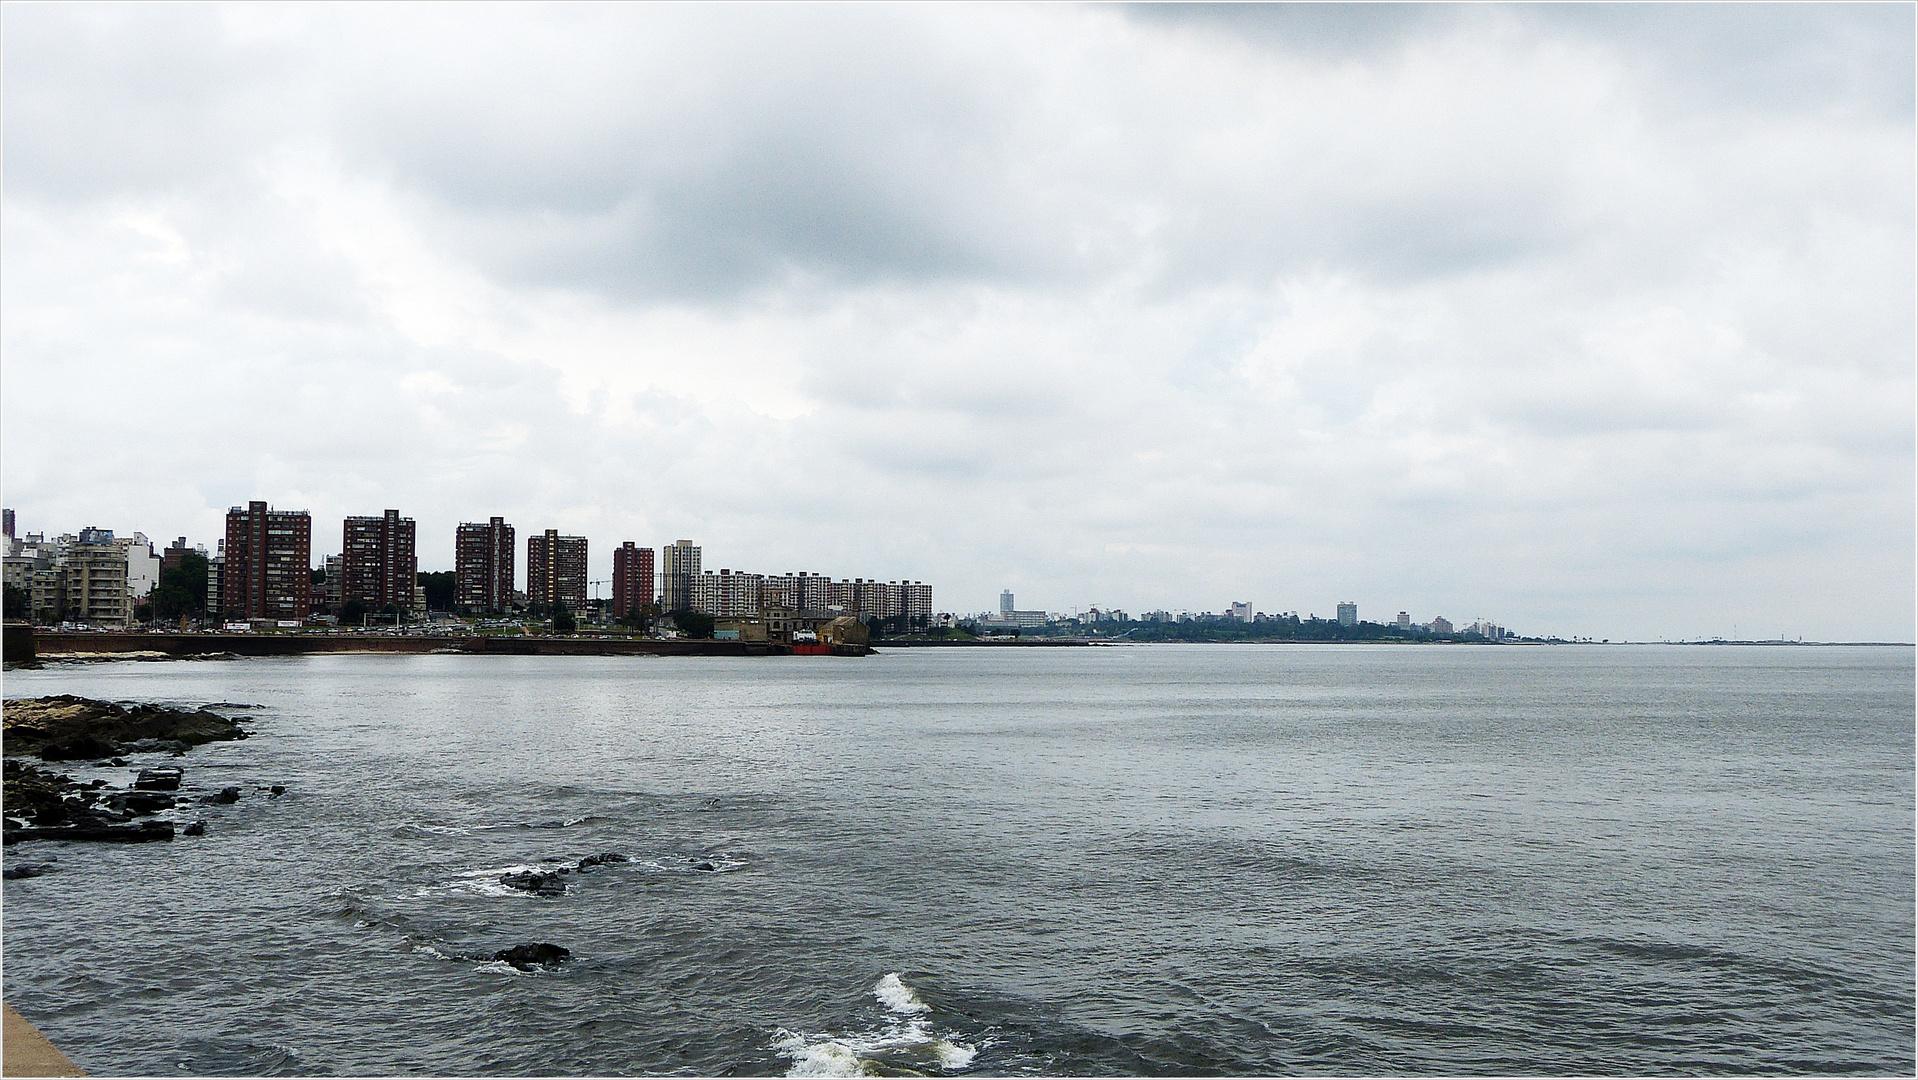 Montevideo am Ufer der Rio de la Plata-Mündung................